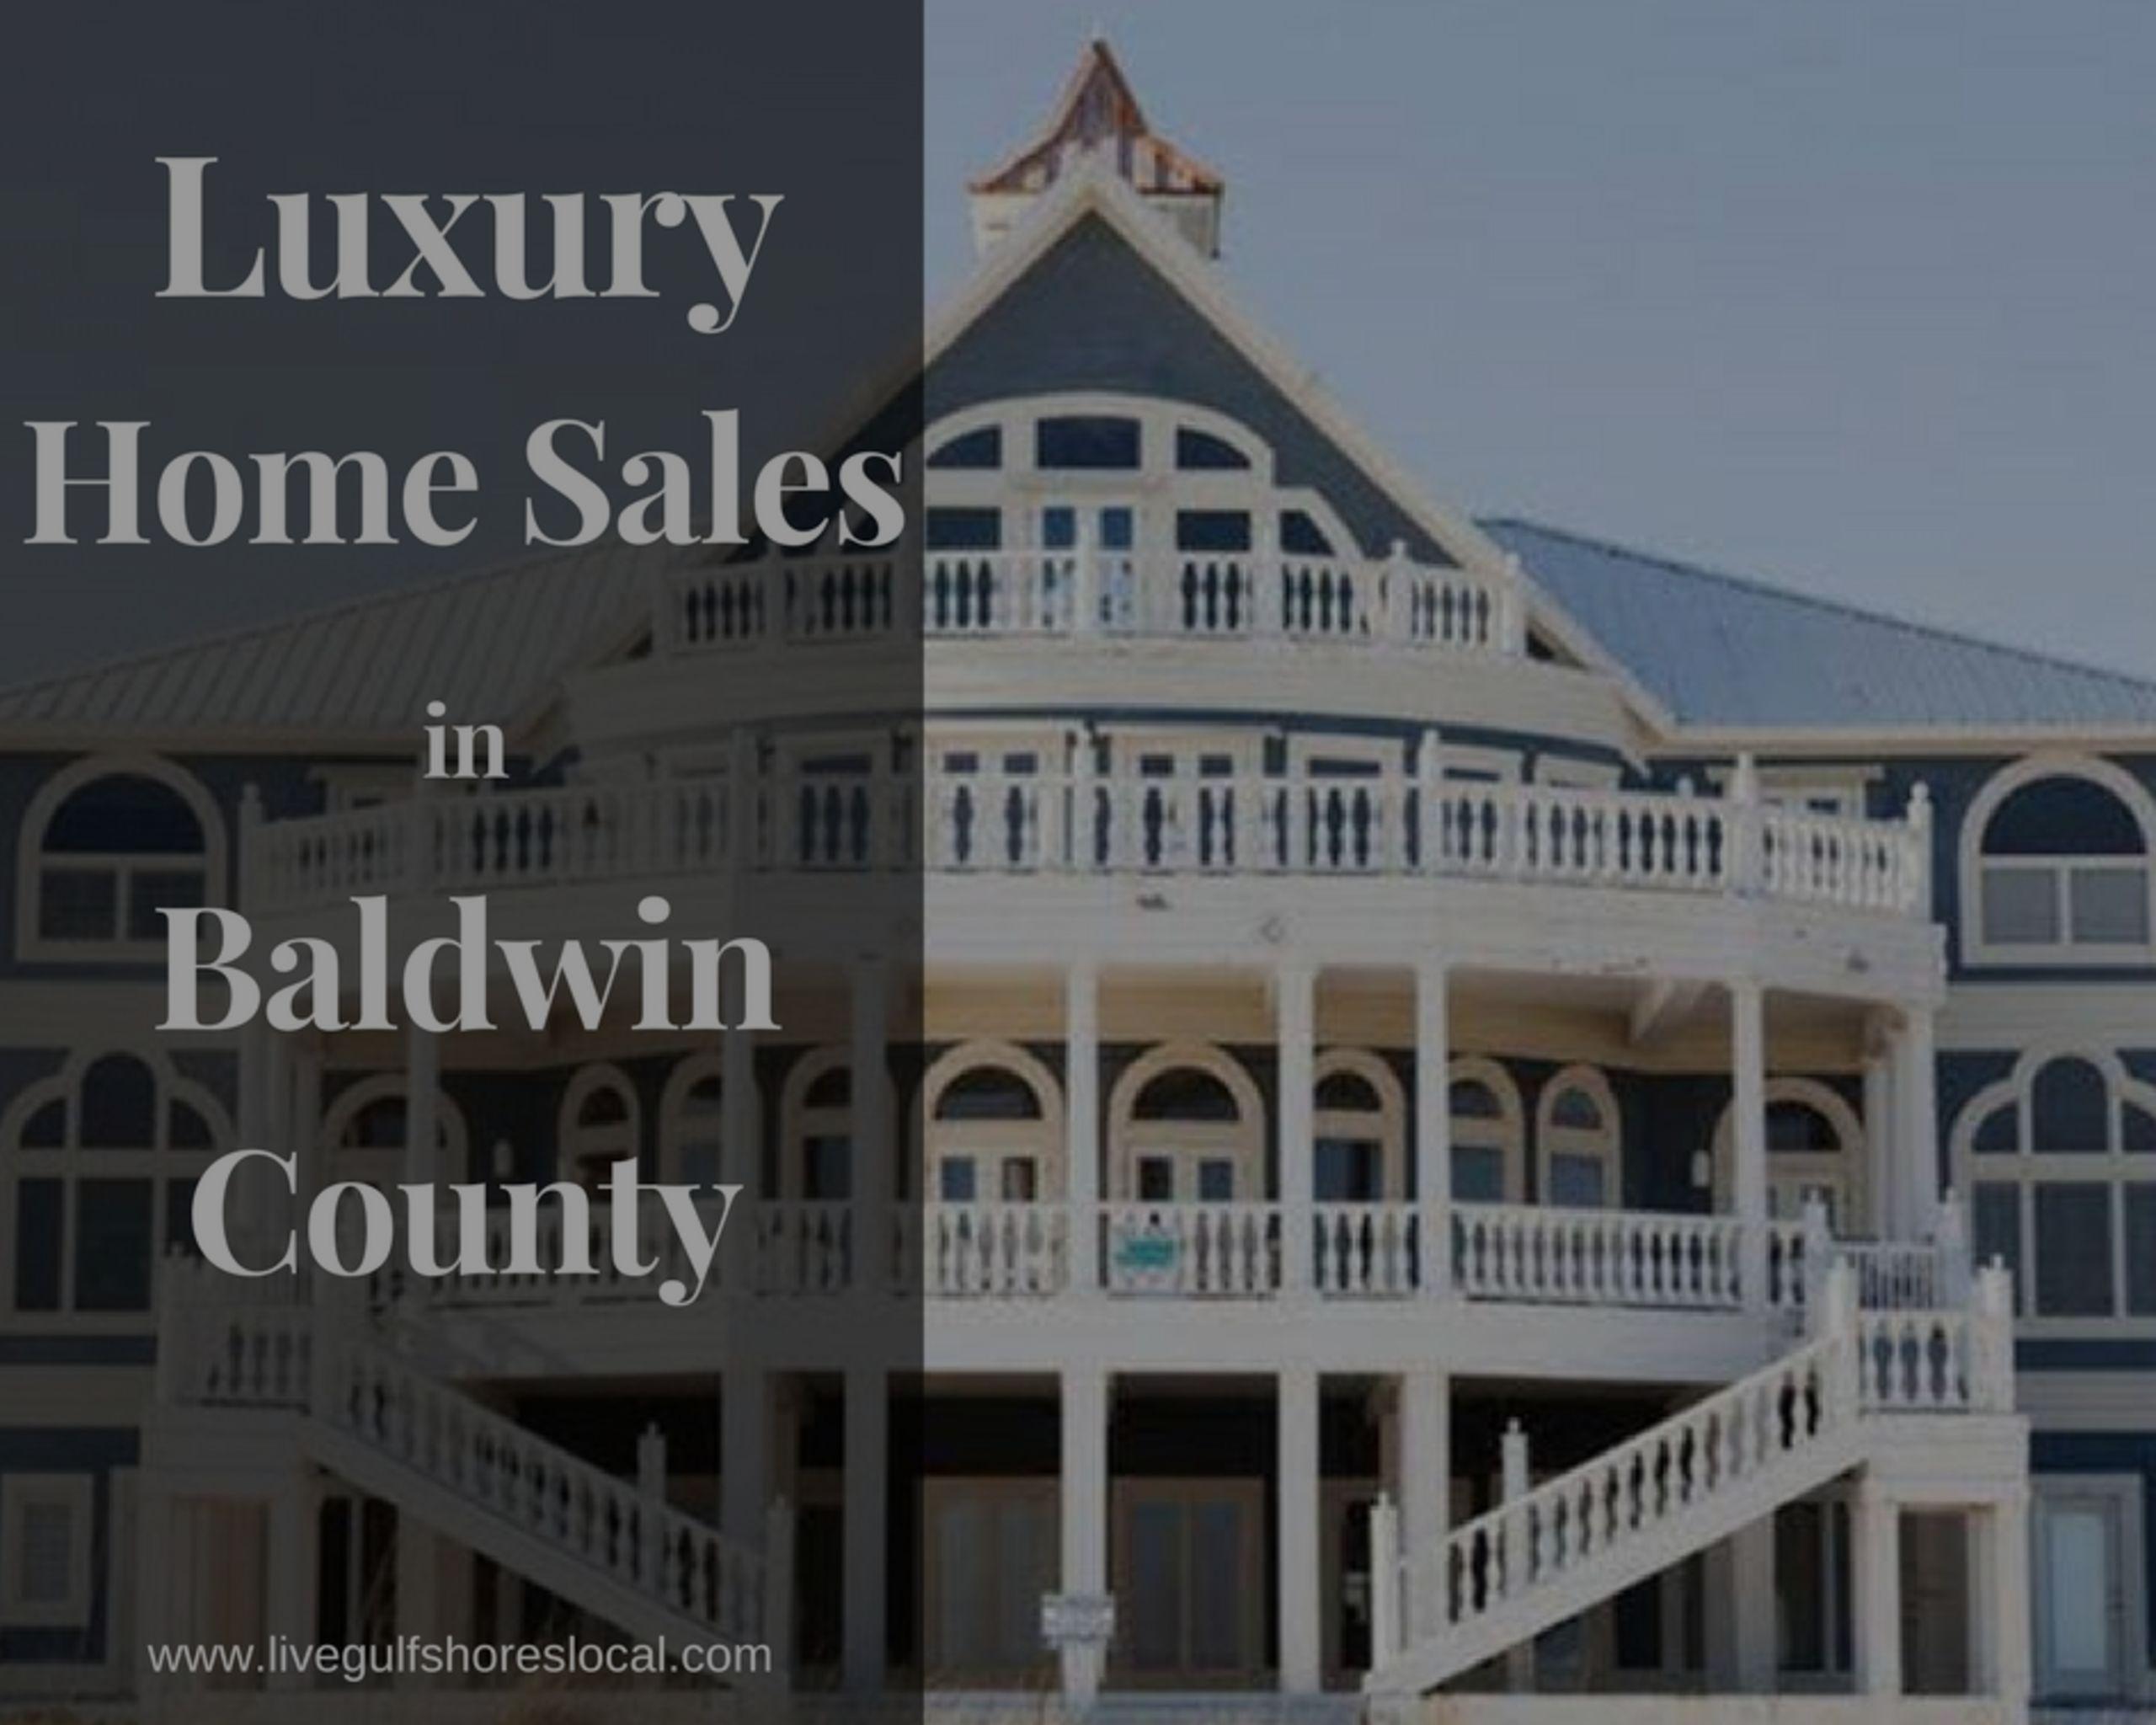 Luxury Homes Sales in Baldwin County – Sept 2019